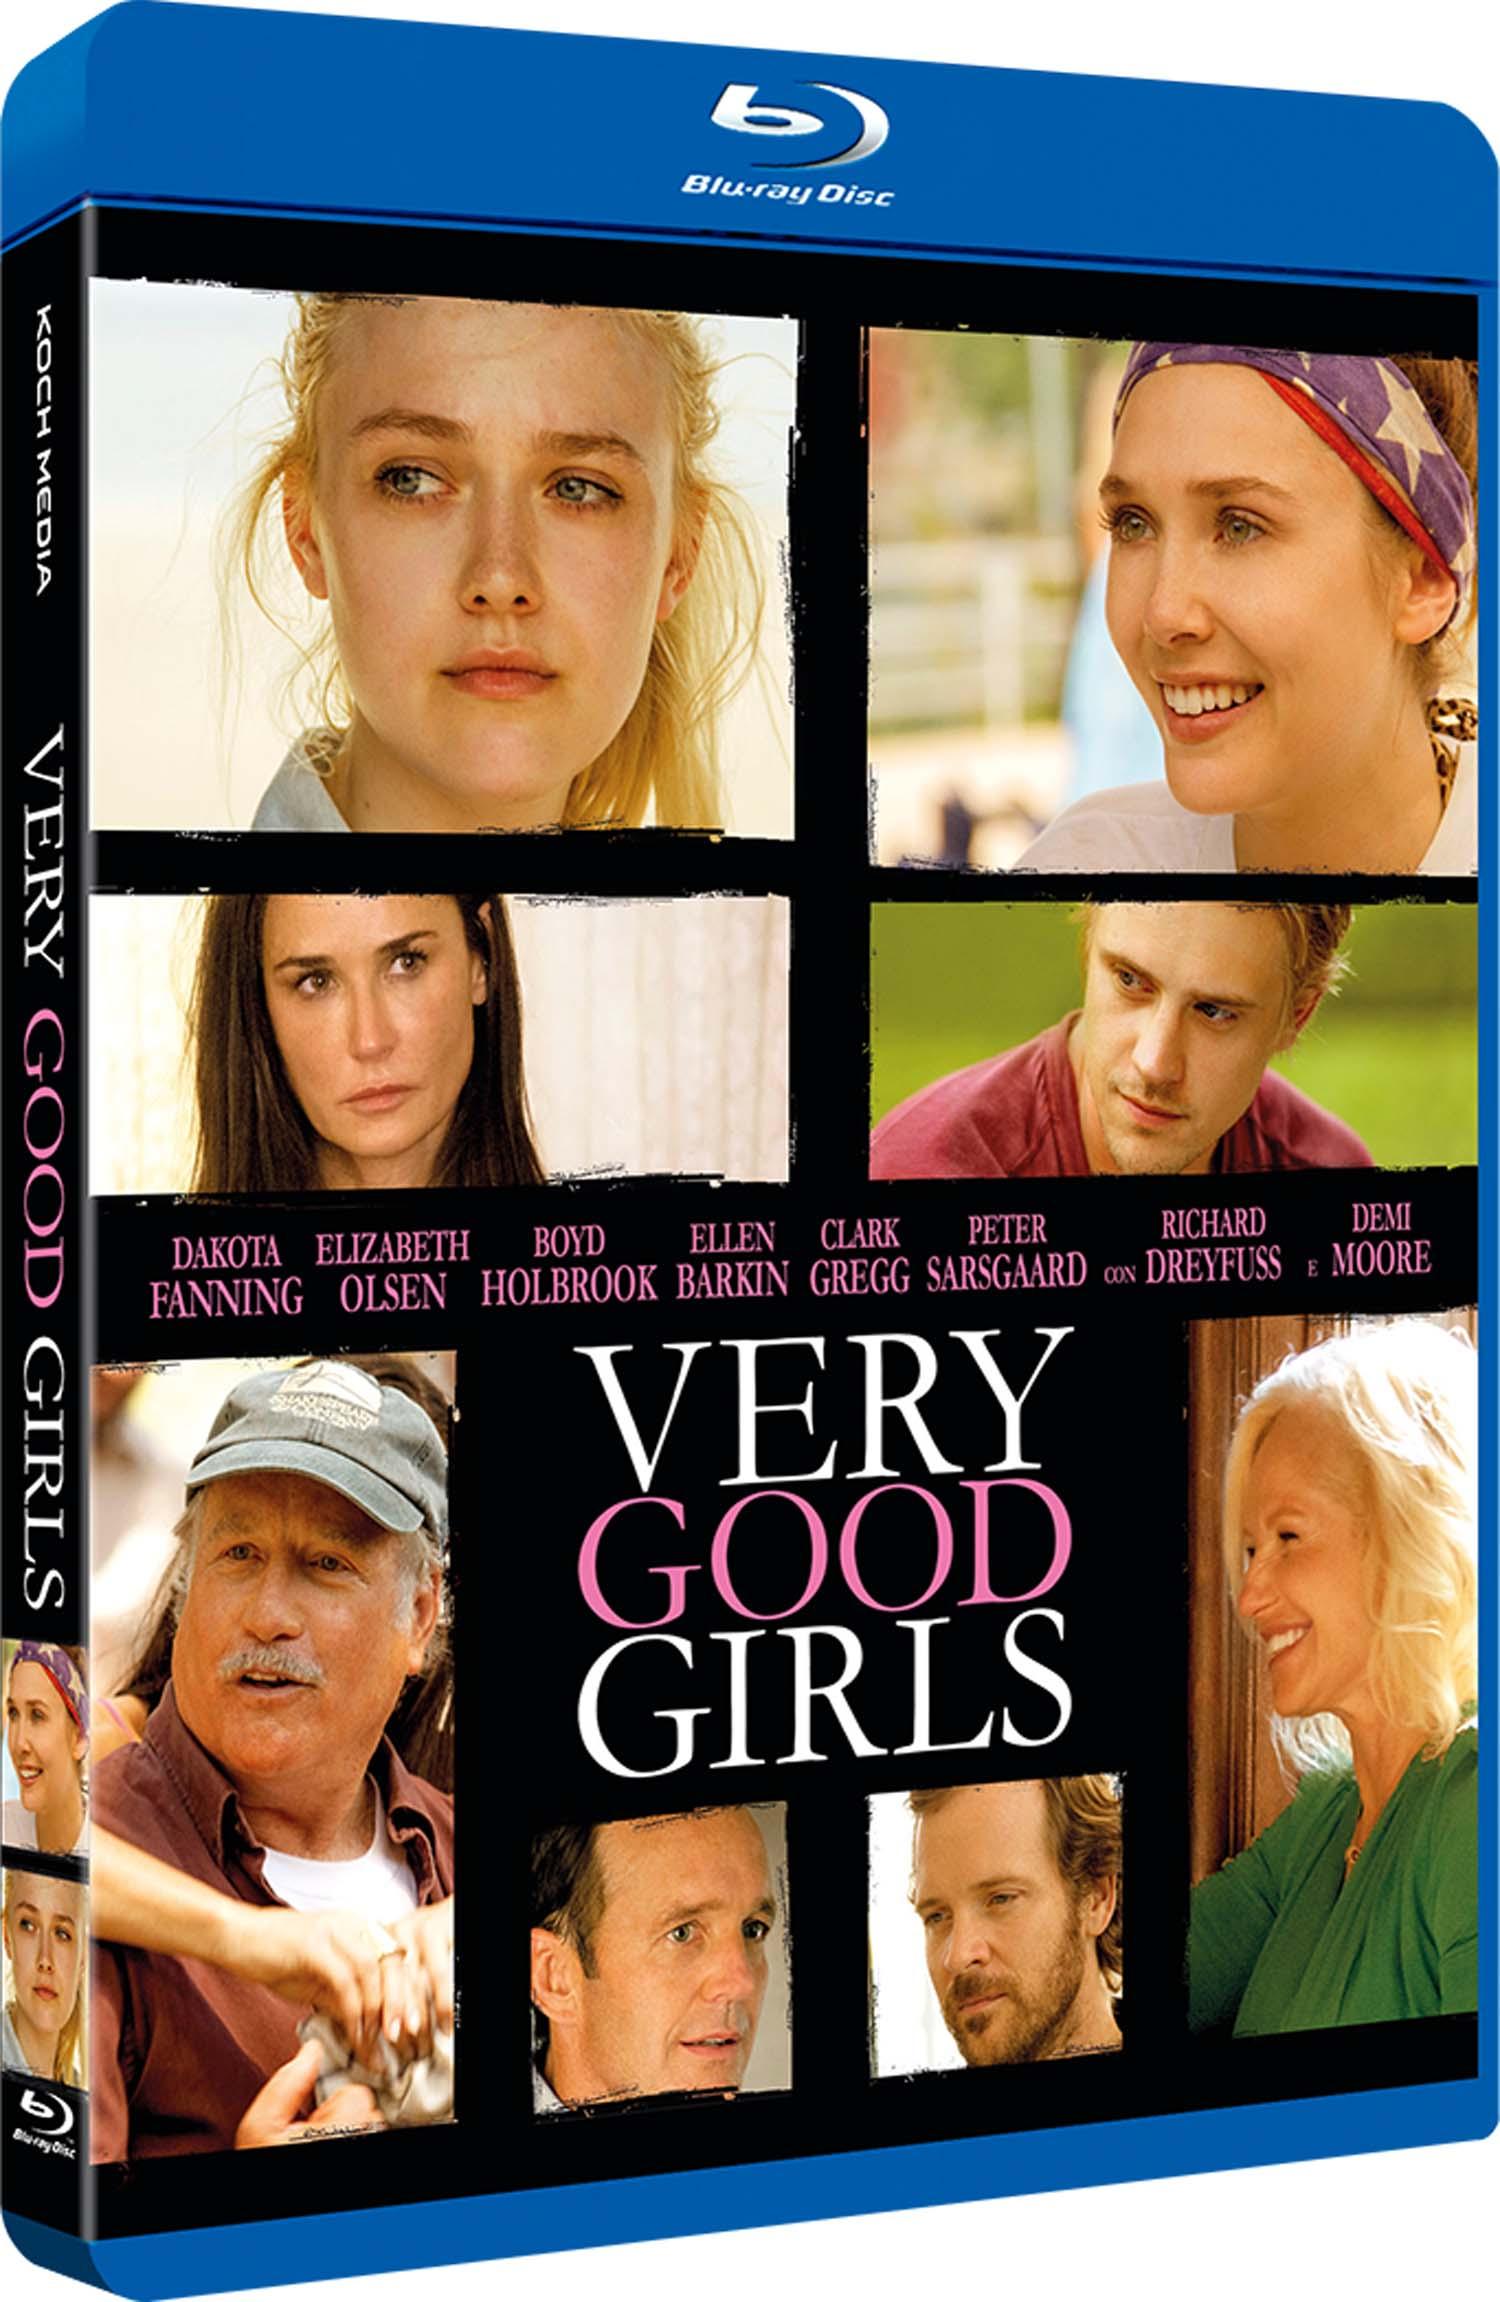 VERY GOOD GIRLS - BLU RAY